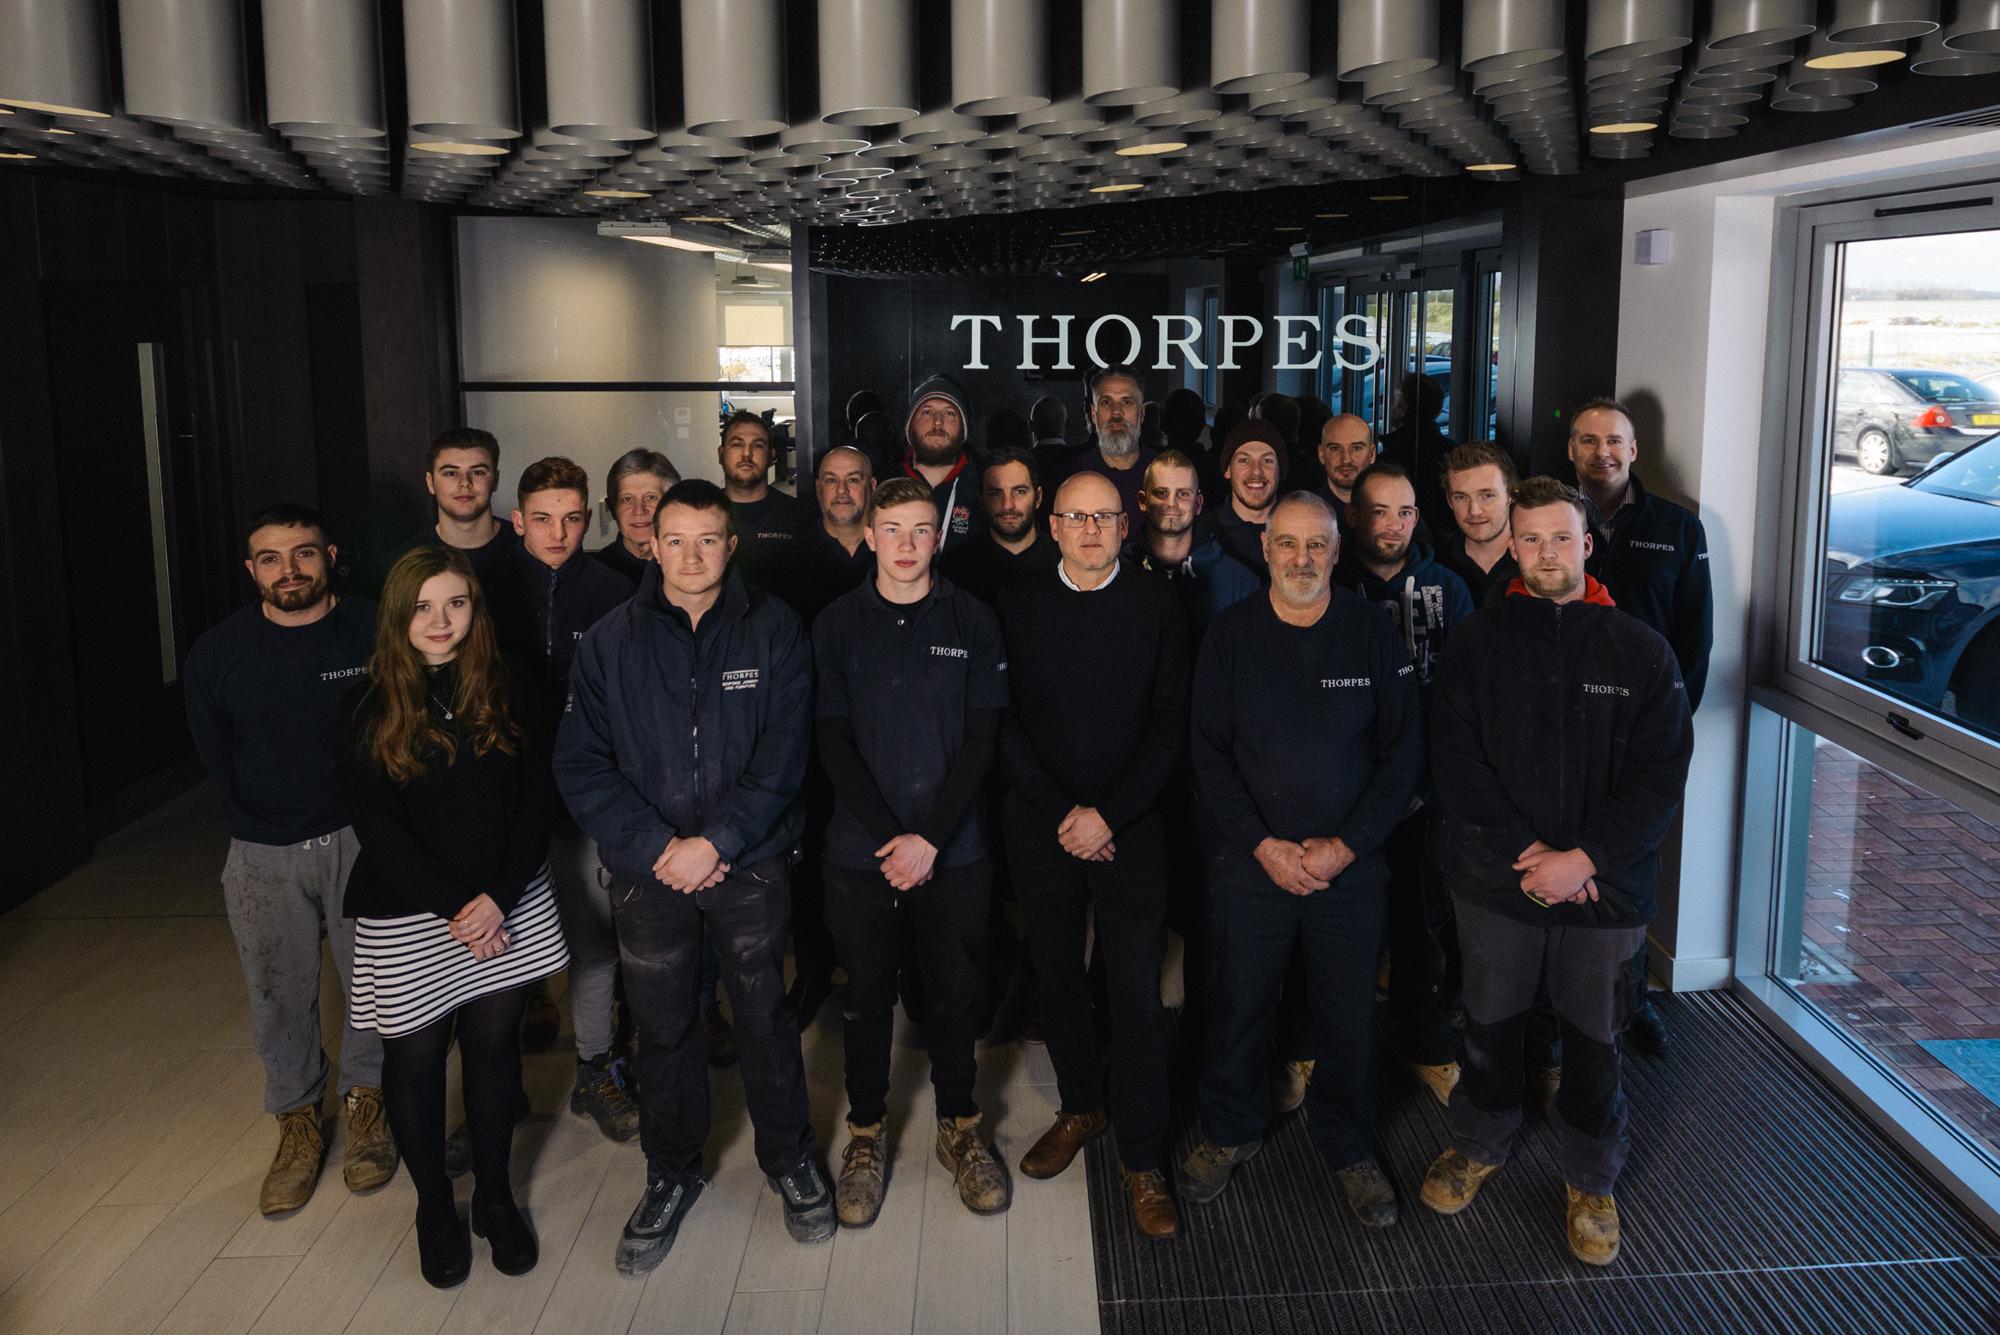 Apprentices_Thorpes-17.jpg